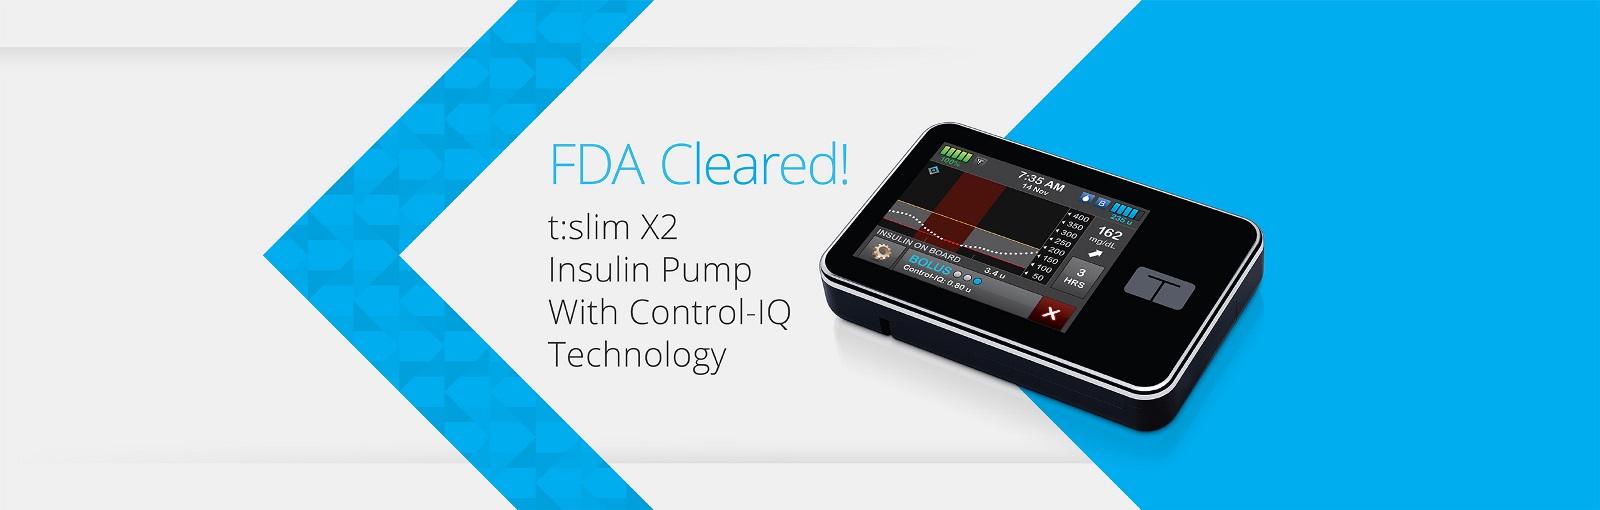 CM-001107_A - Digital, Image, Website Blog Banner, Control-IQ FDA Clearance